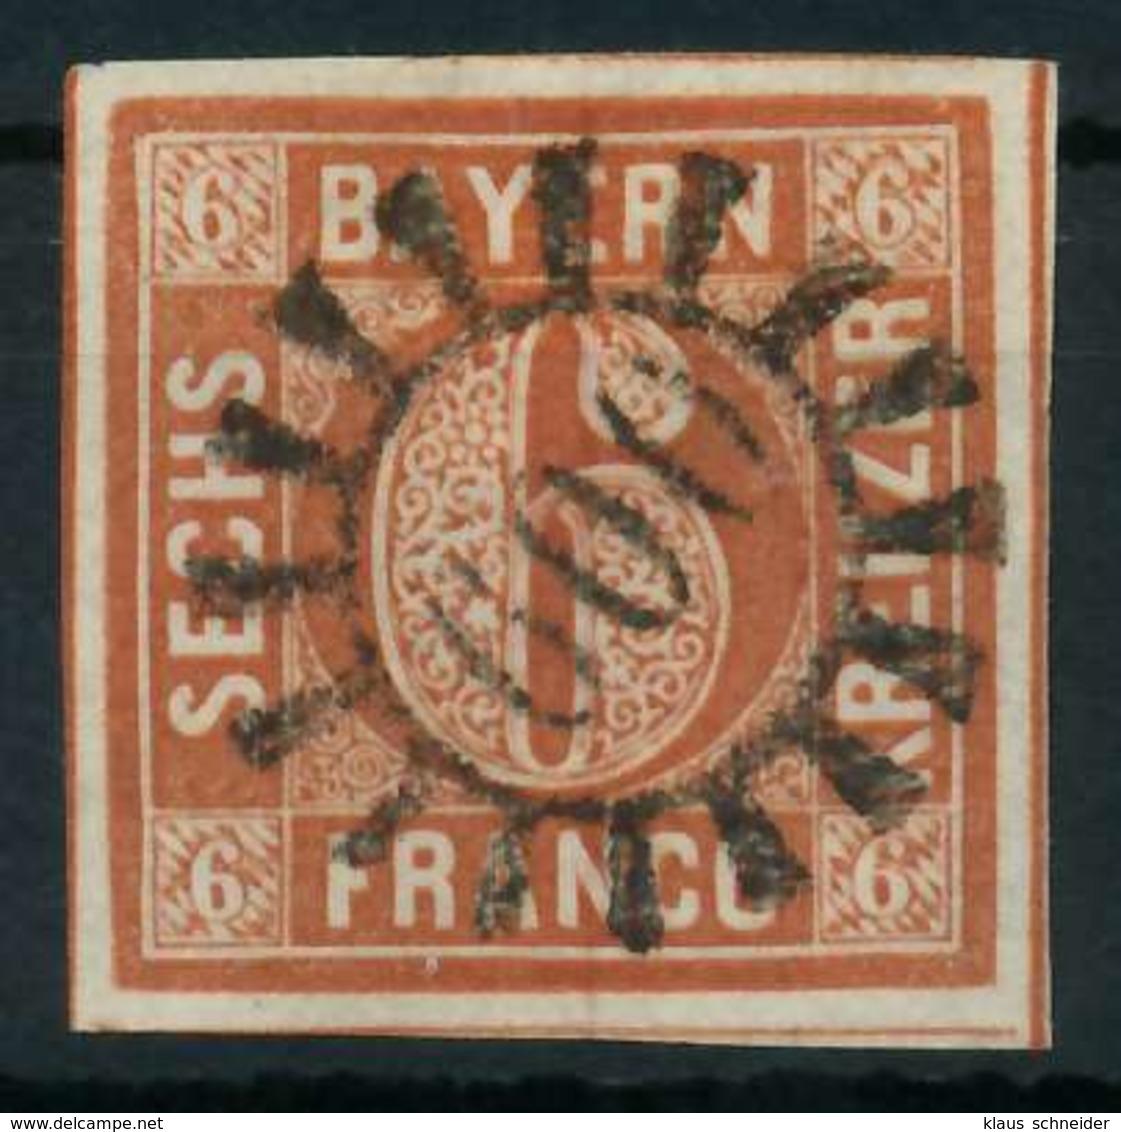 BAYERN QUADRATE Nr 4II GMR 600 Zentrisch Gestempelt X884382 - Bayern